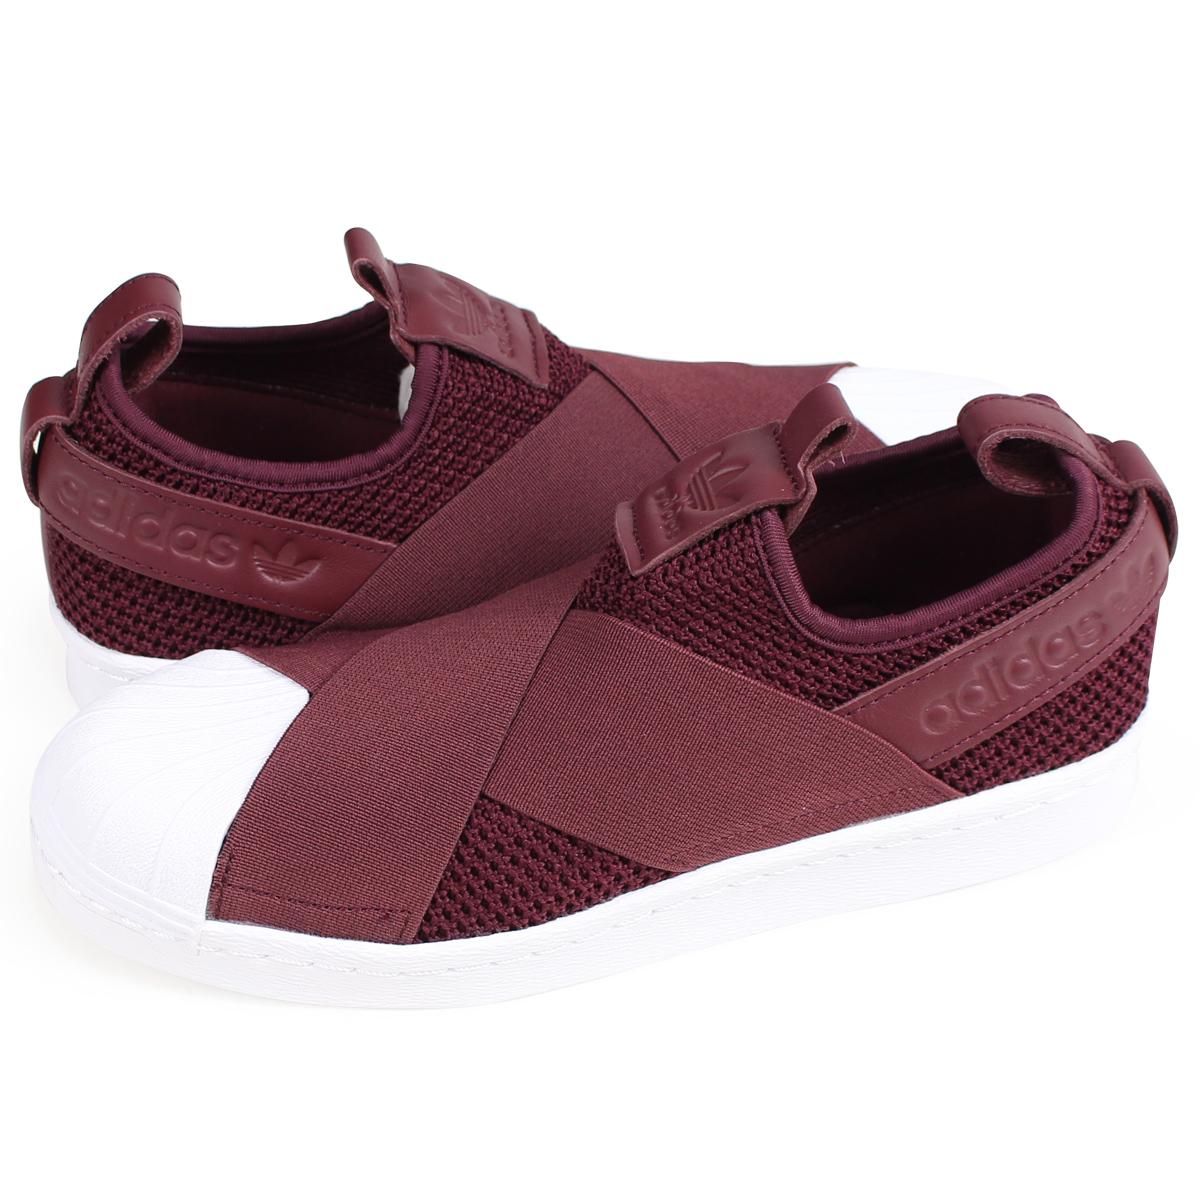 reputable site 13741 b1dc0 adidas Originals SUPERSTAR SLIP-ON W Adidas originals superstar Lady's  sneakers slip-ons B37371 burgundy [9/13 Shinnyu load]